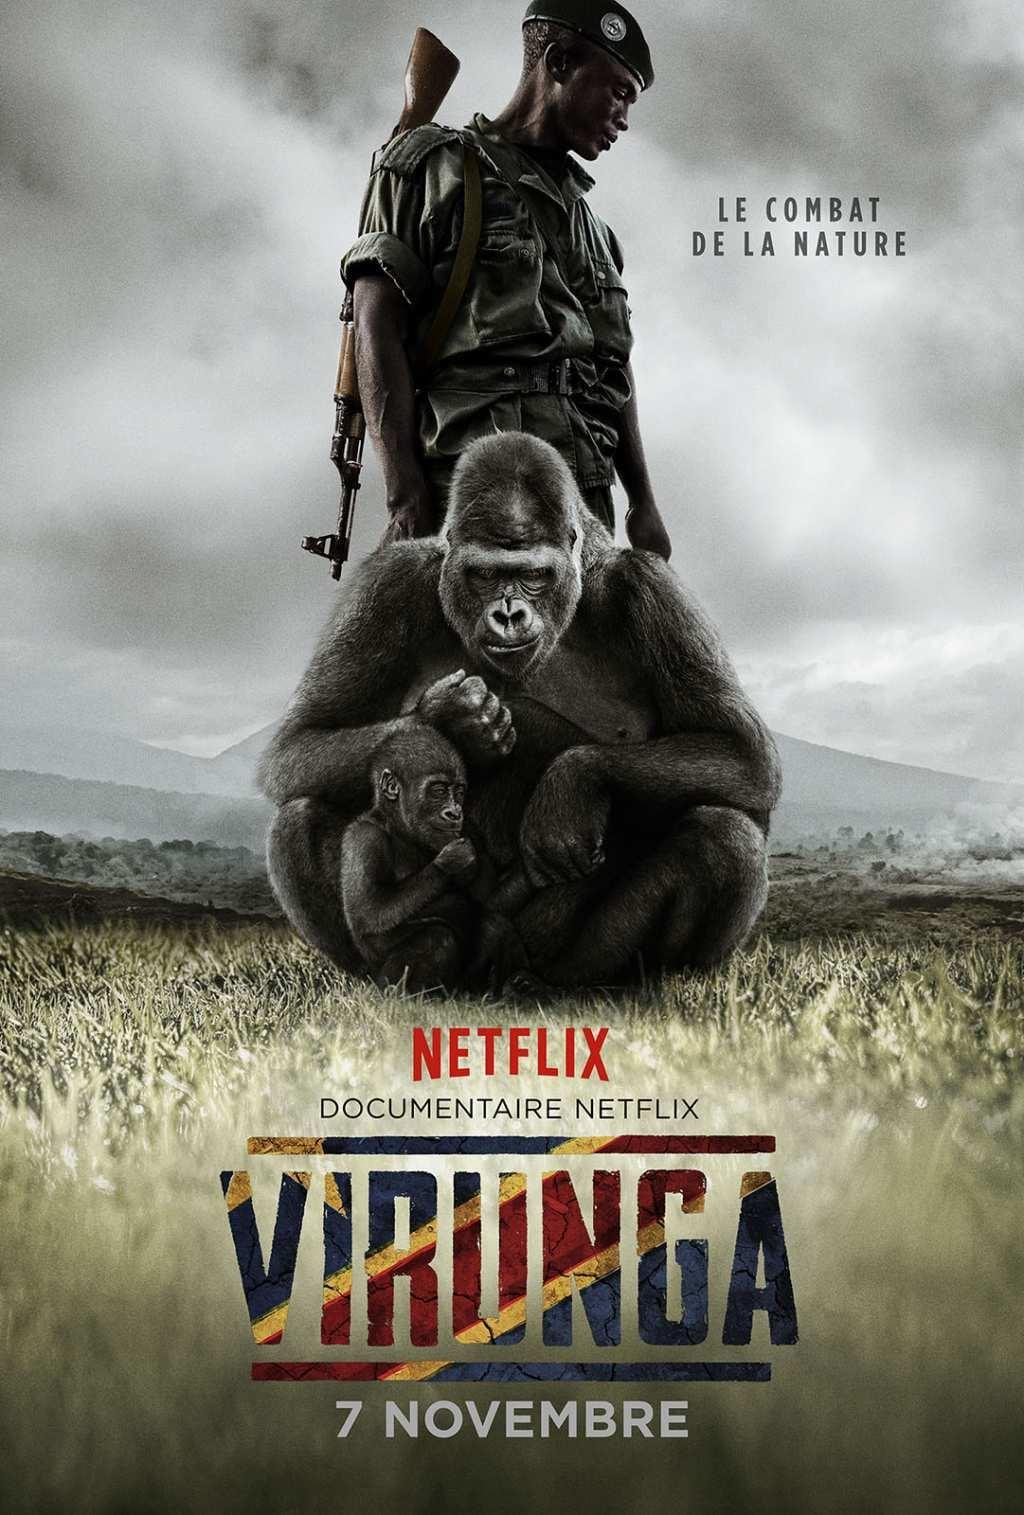 Regarder Virunga en streaming gratuit